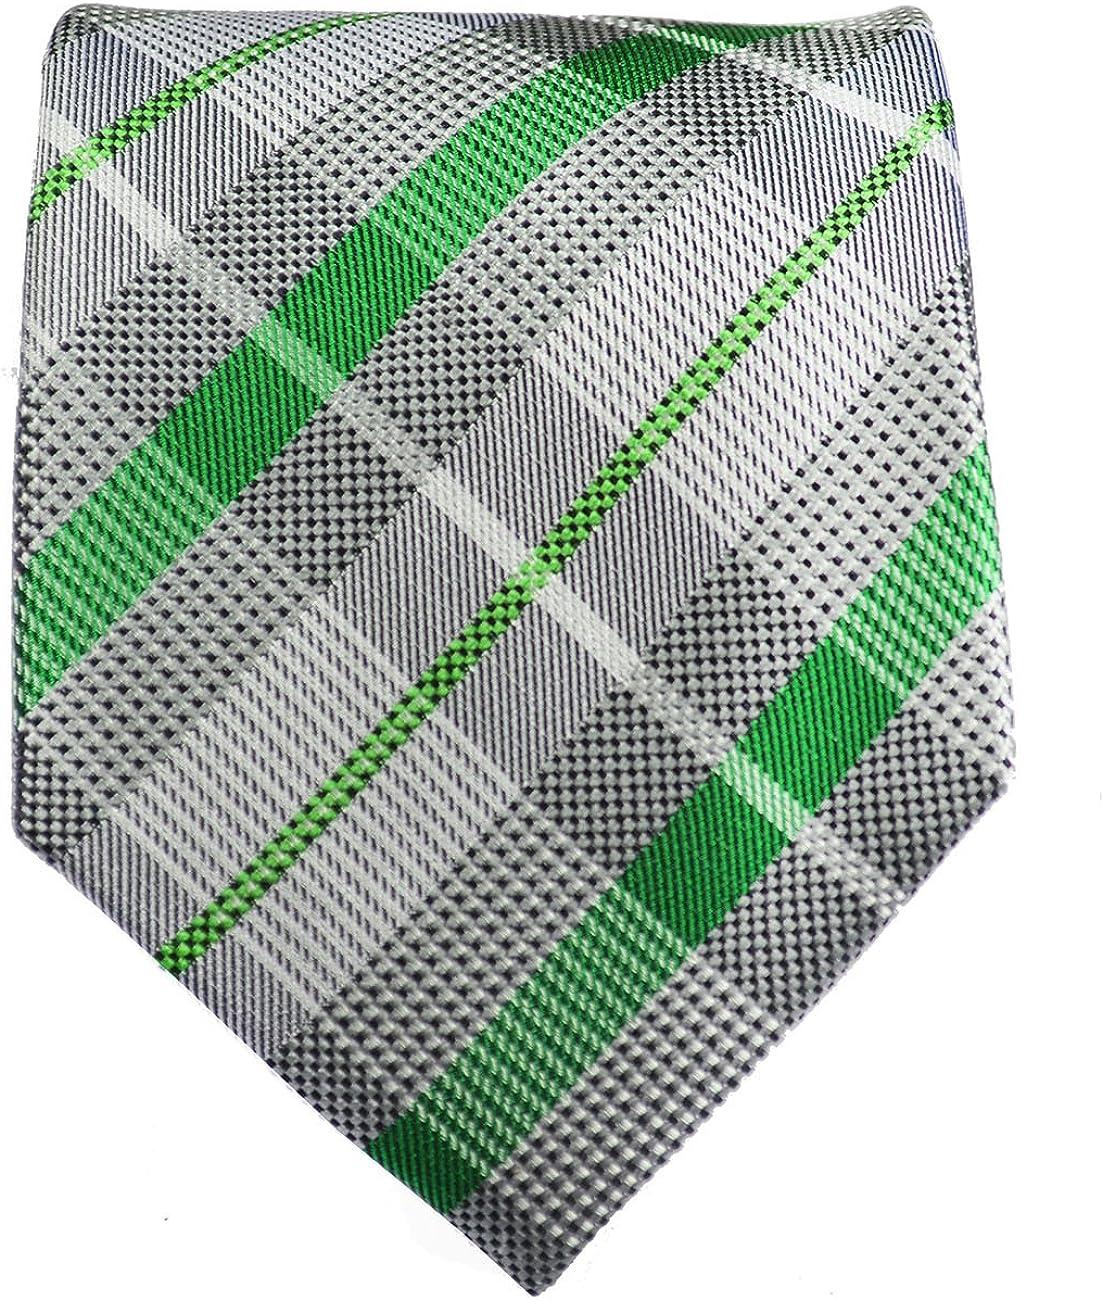 Miami Mall Silver Low price and Green Paul Malone Square Tie Silk Pocket